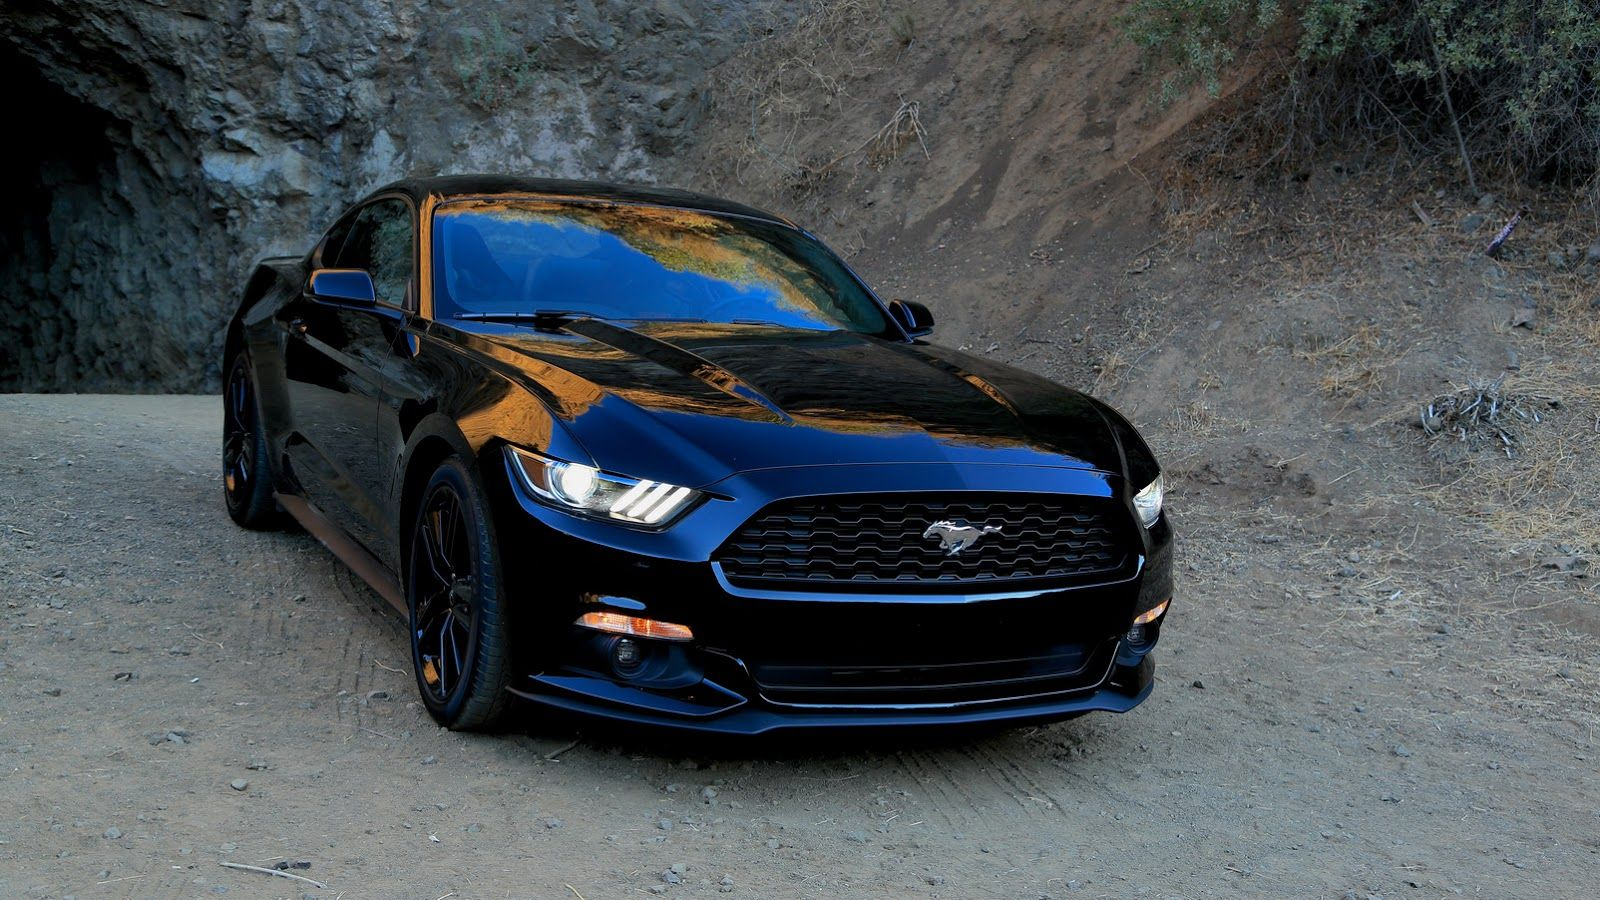 2015 Ford Mustang Wallpaper Black Image 111 Cars Pinterest